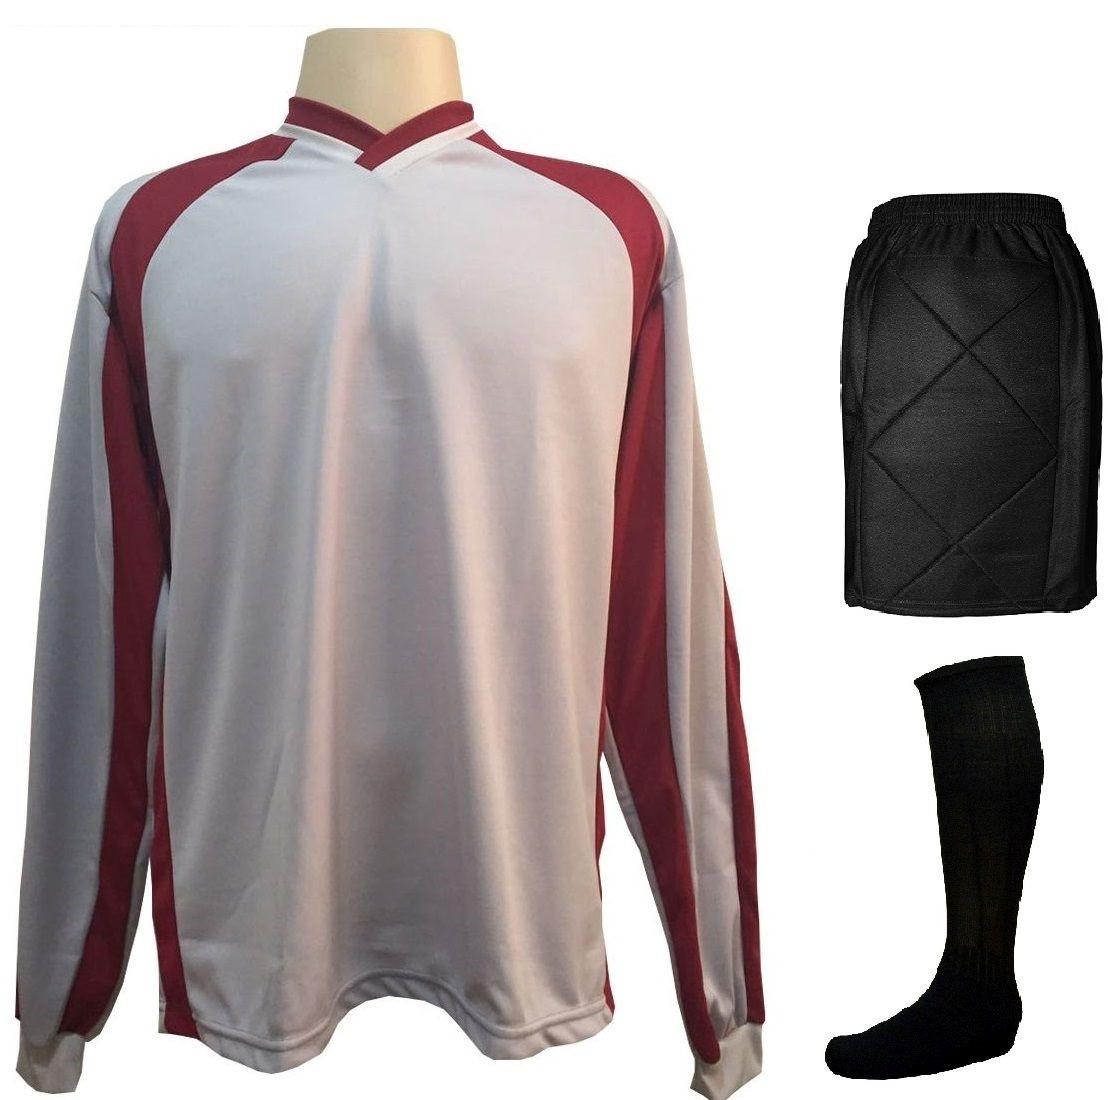 Fardamento Completo modelo Milan 20+1 (20 camisas Royal/Branco + 20 calções modelo Madrid Branco + 20 pares de meiões branco + 1 conjunto de goleiro) + Brindes